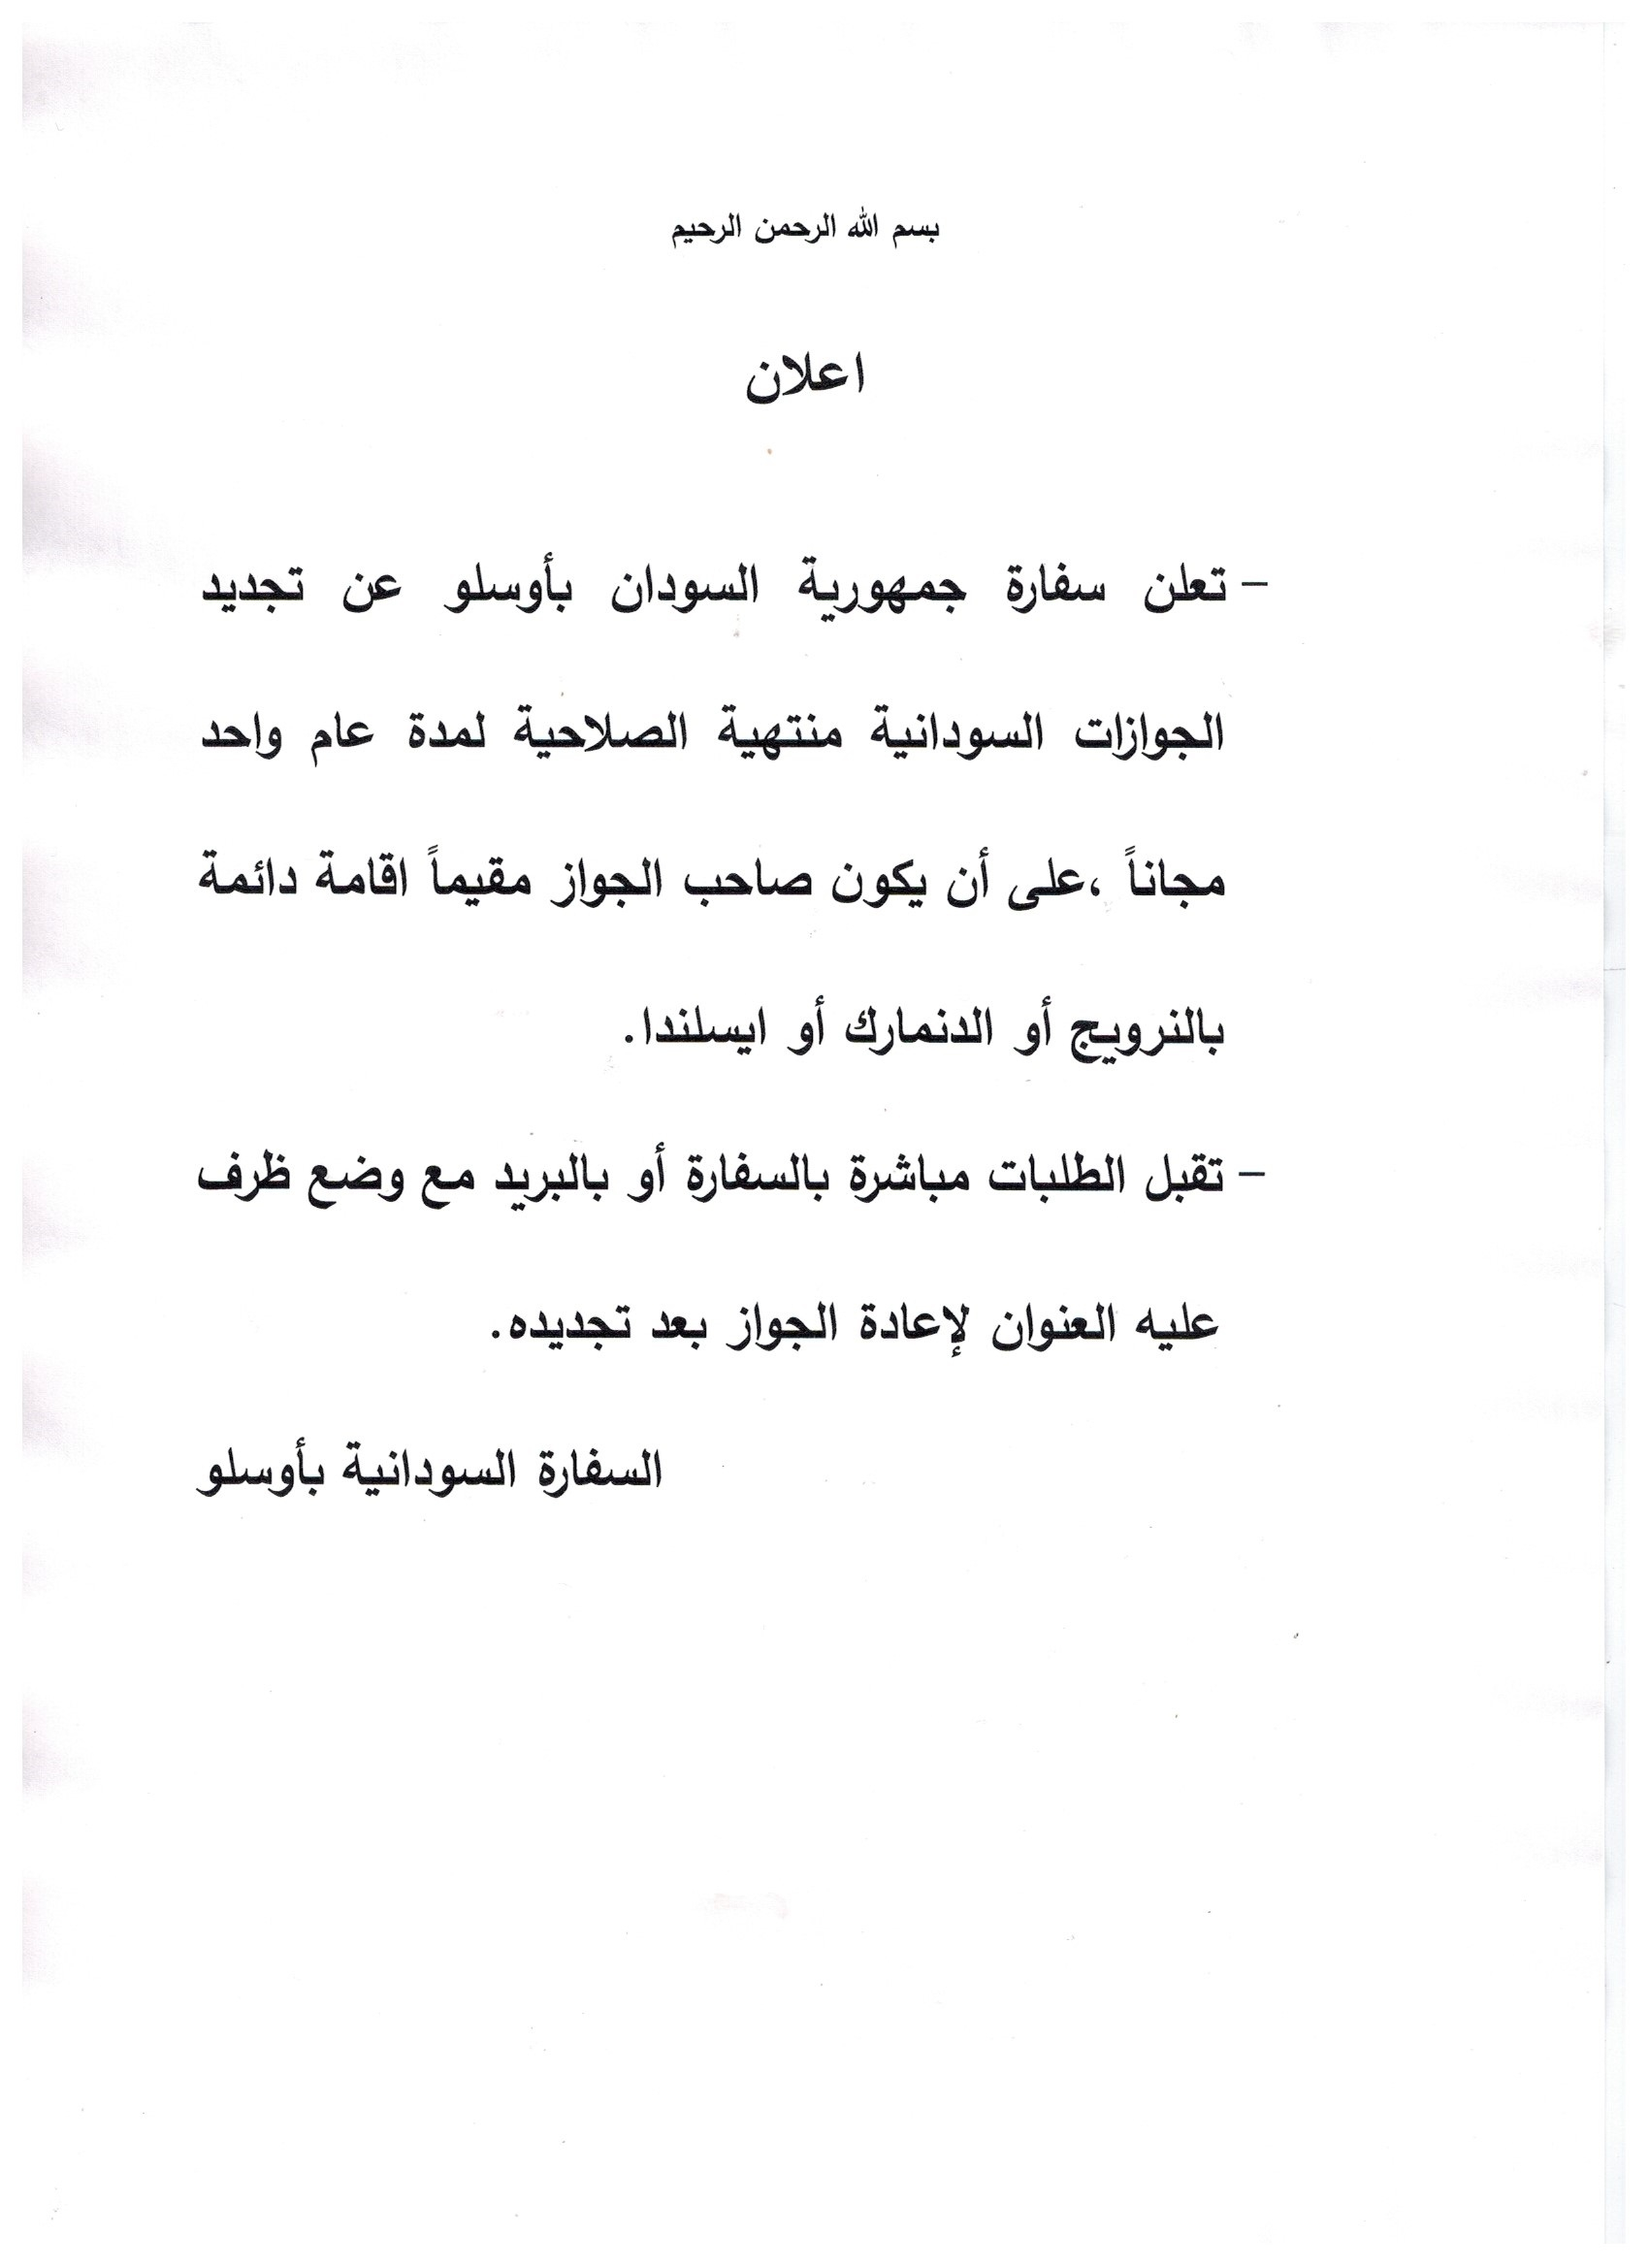 sudans ambassade fornyer pass 21. august 2020